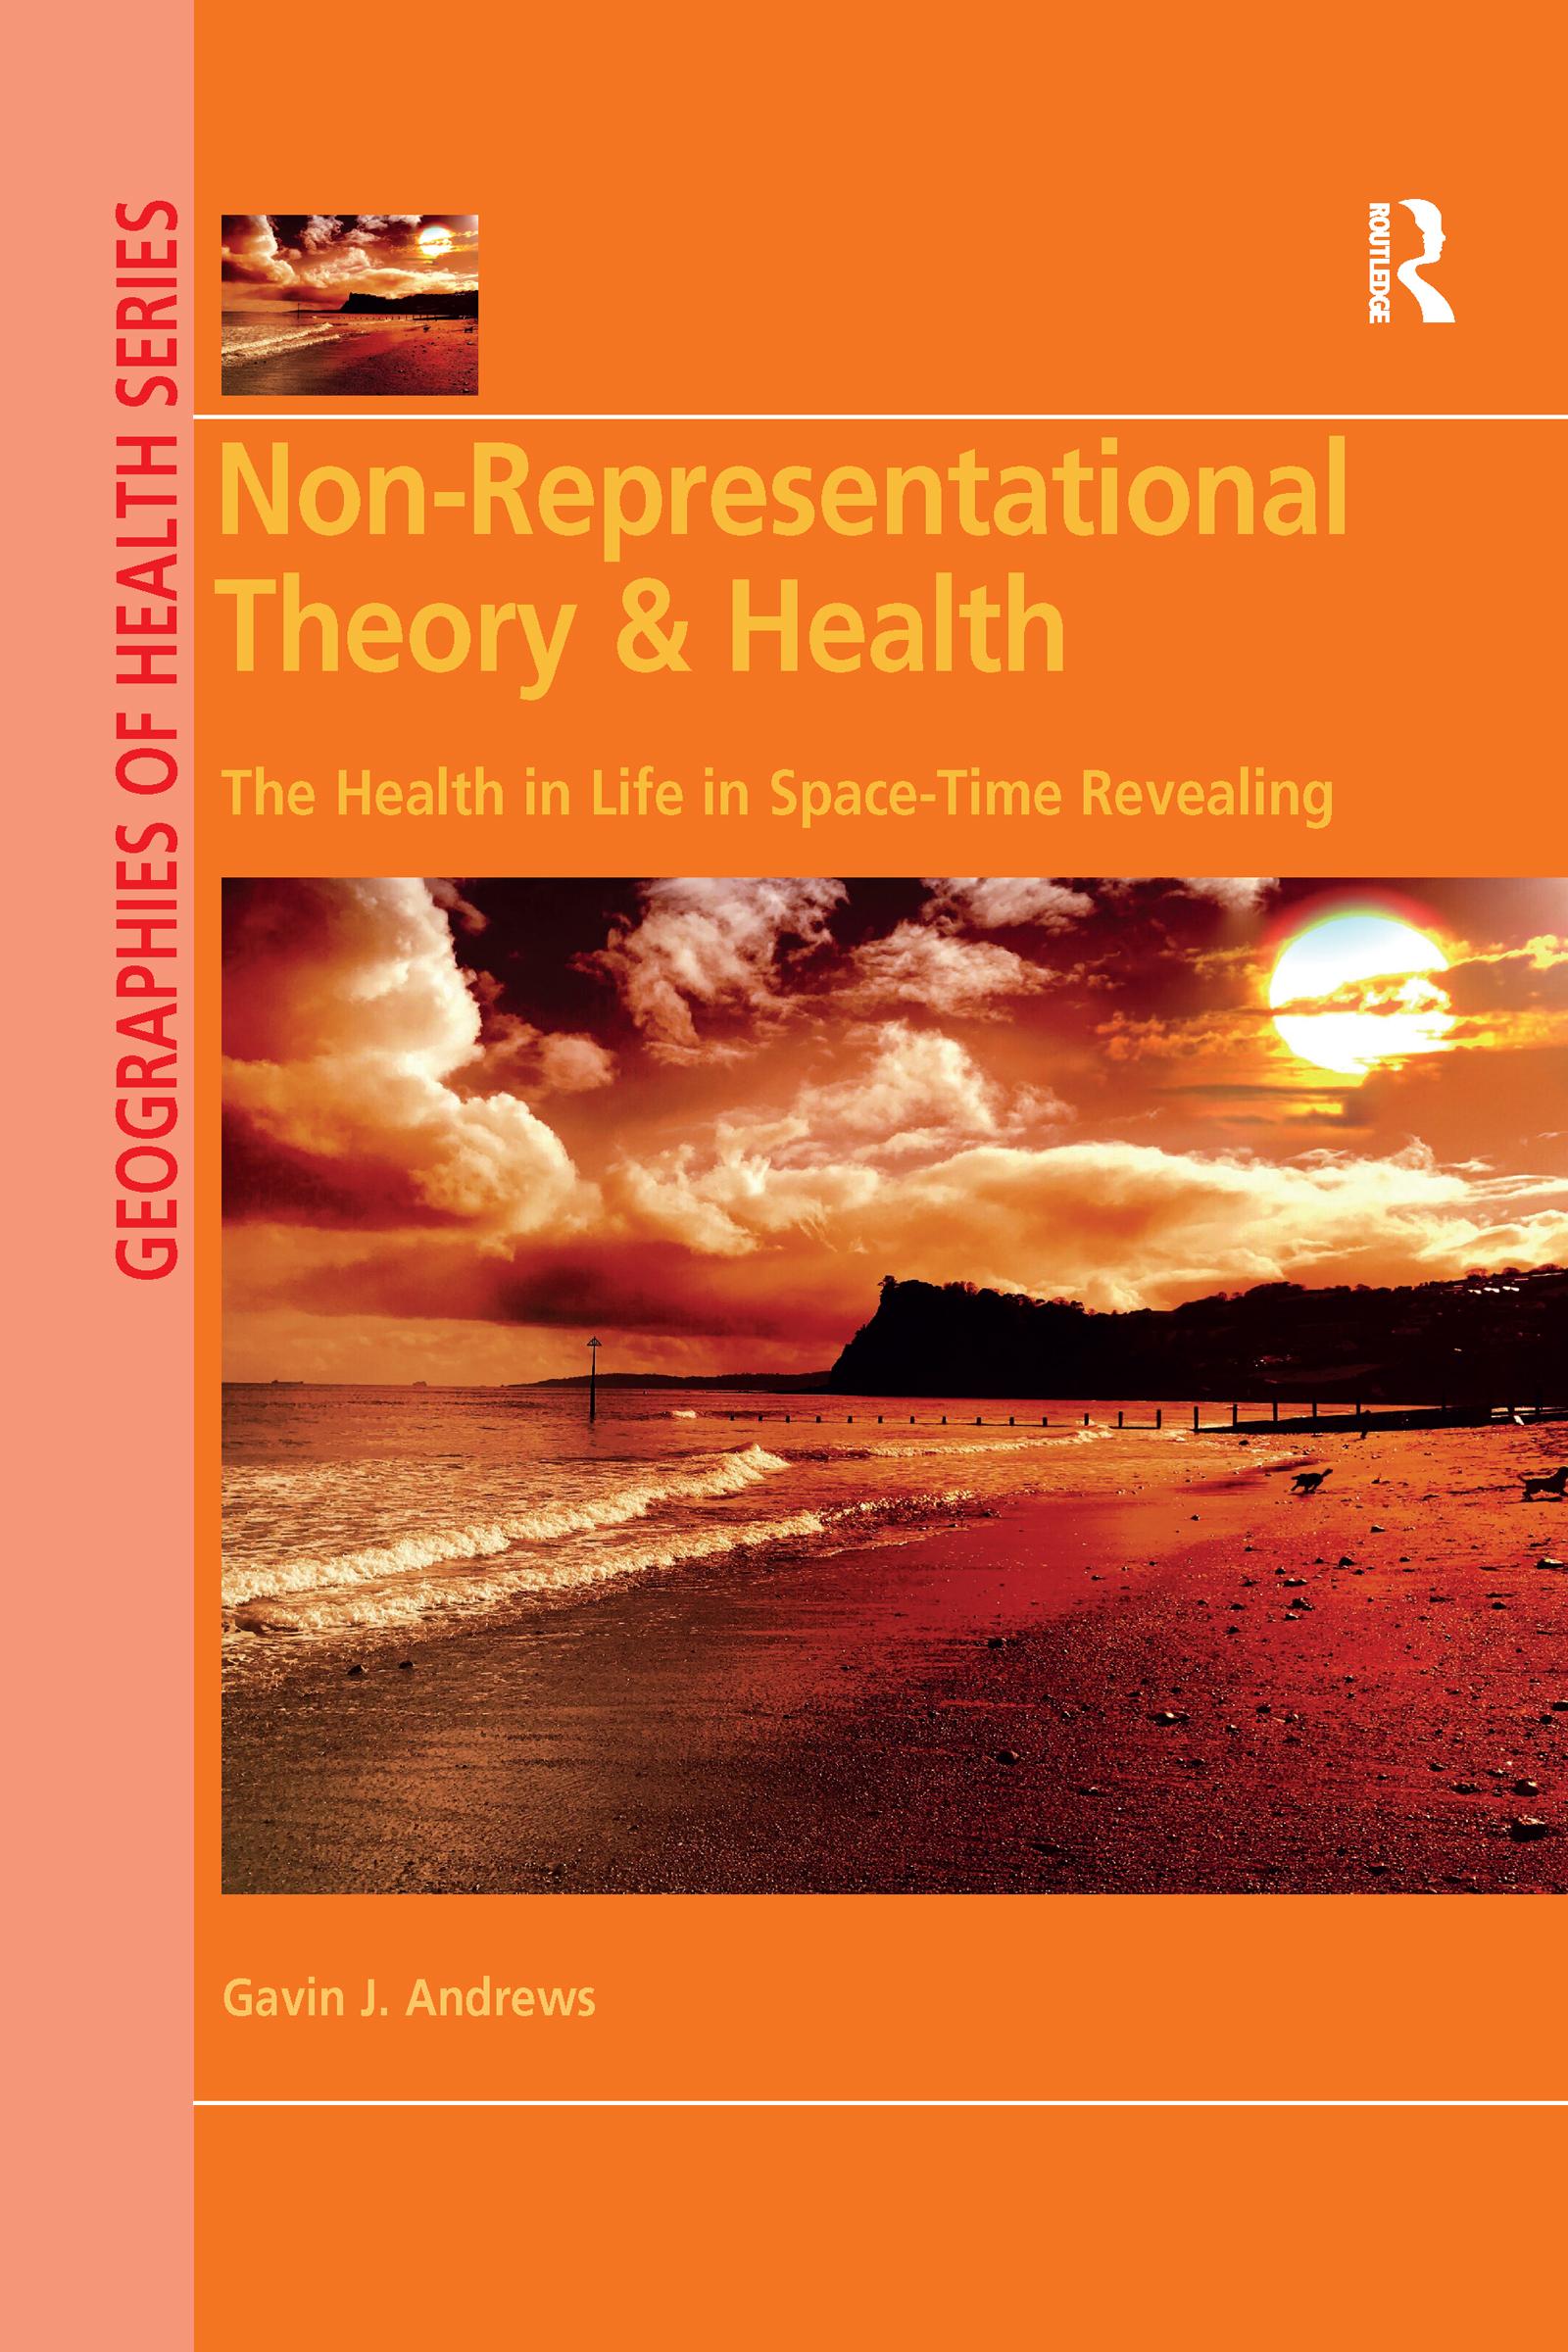 Non-Representational Theory & Health